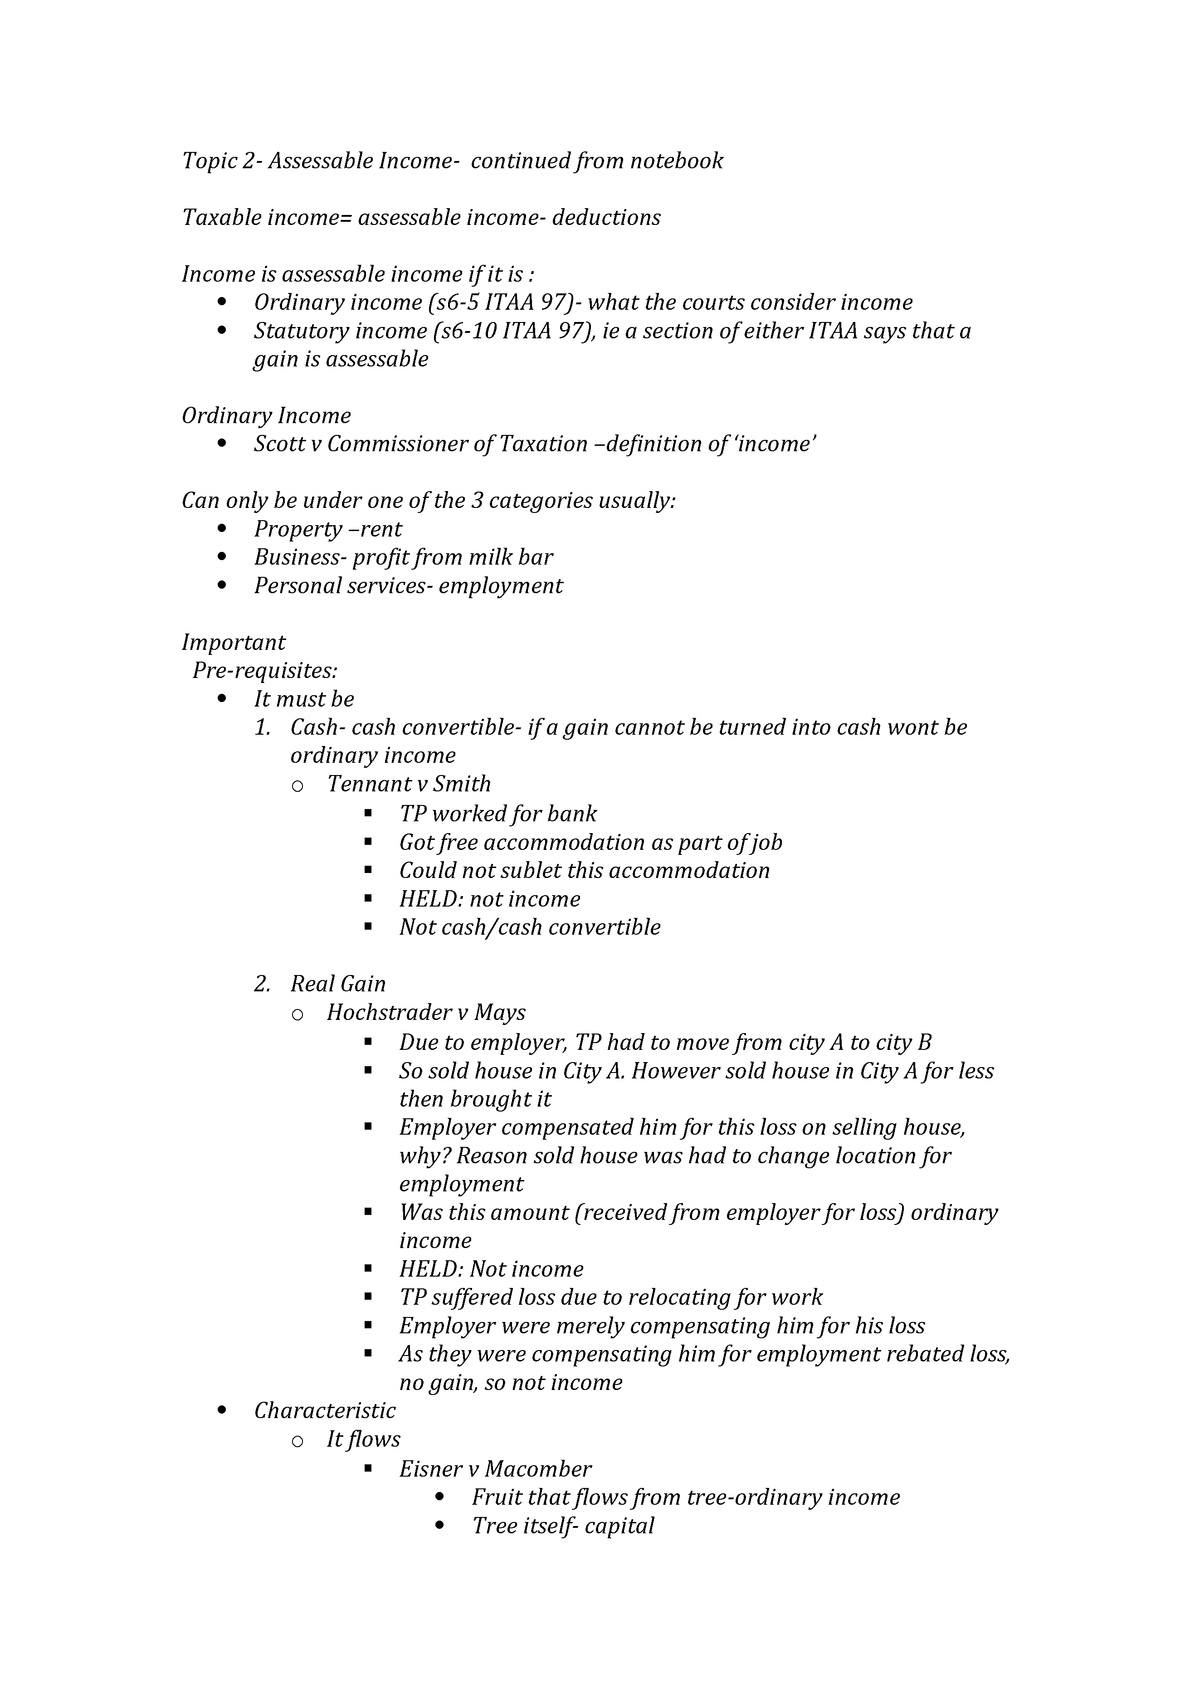 Mlc302 - Lecture notes 2 - MLC301 - Deakin - StuDocu